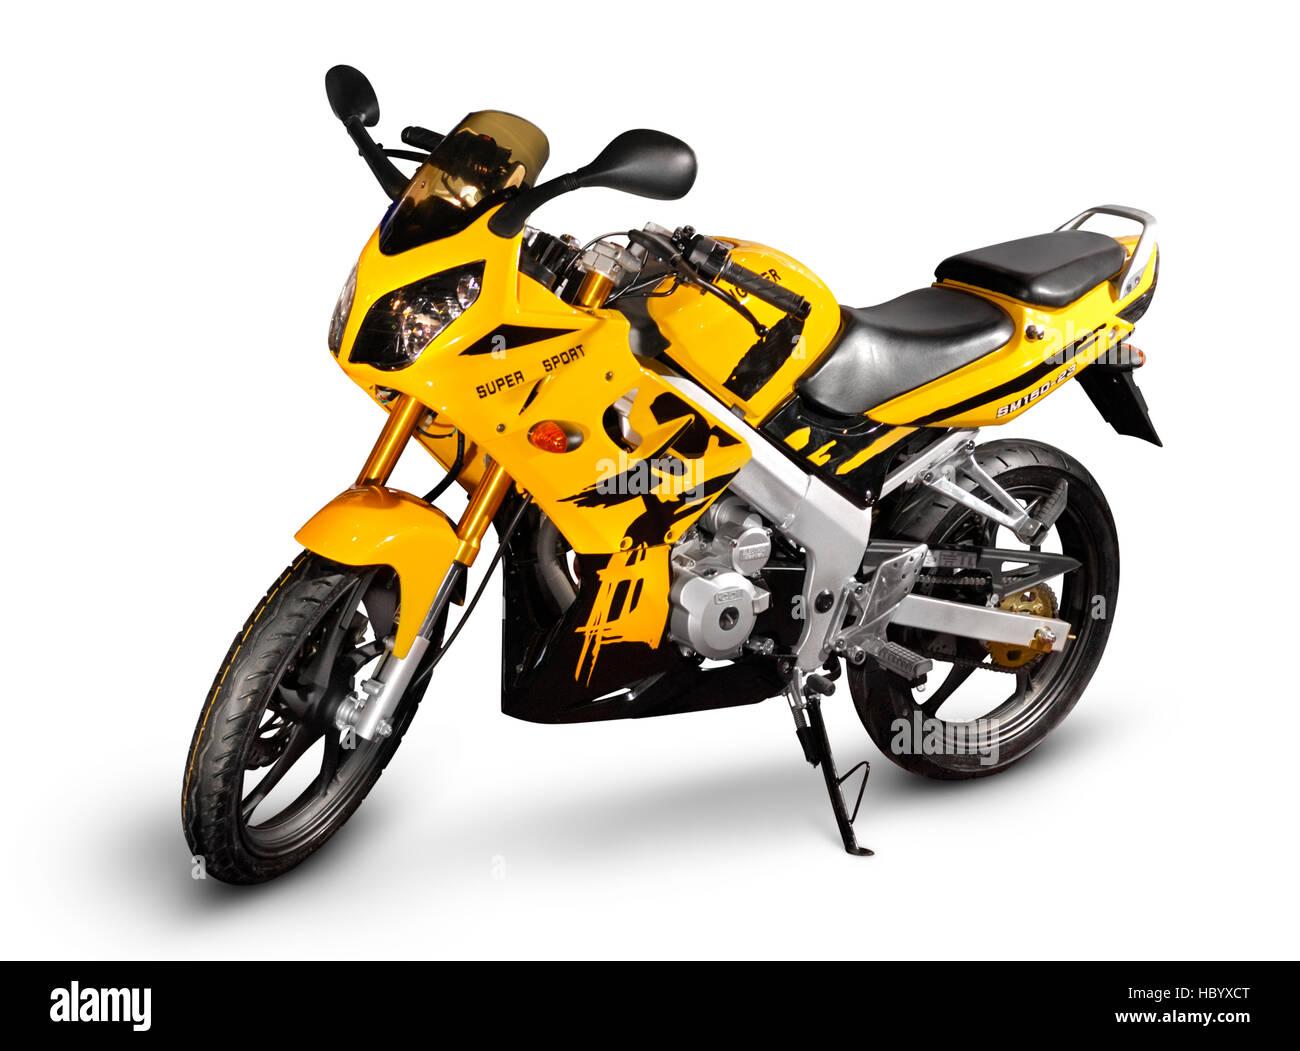 Yellow Chinese racing motorcycle SM150-23, light sport bike - Stock Image